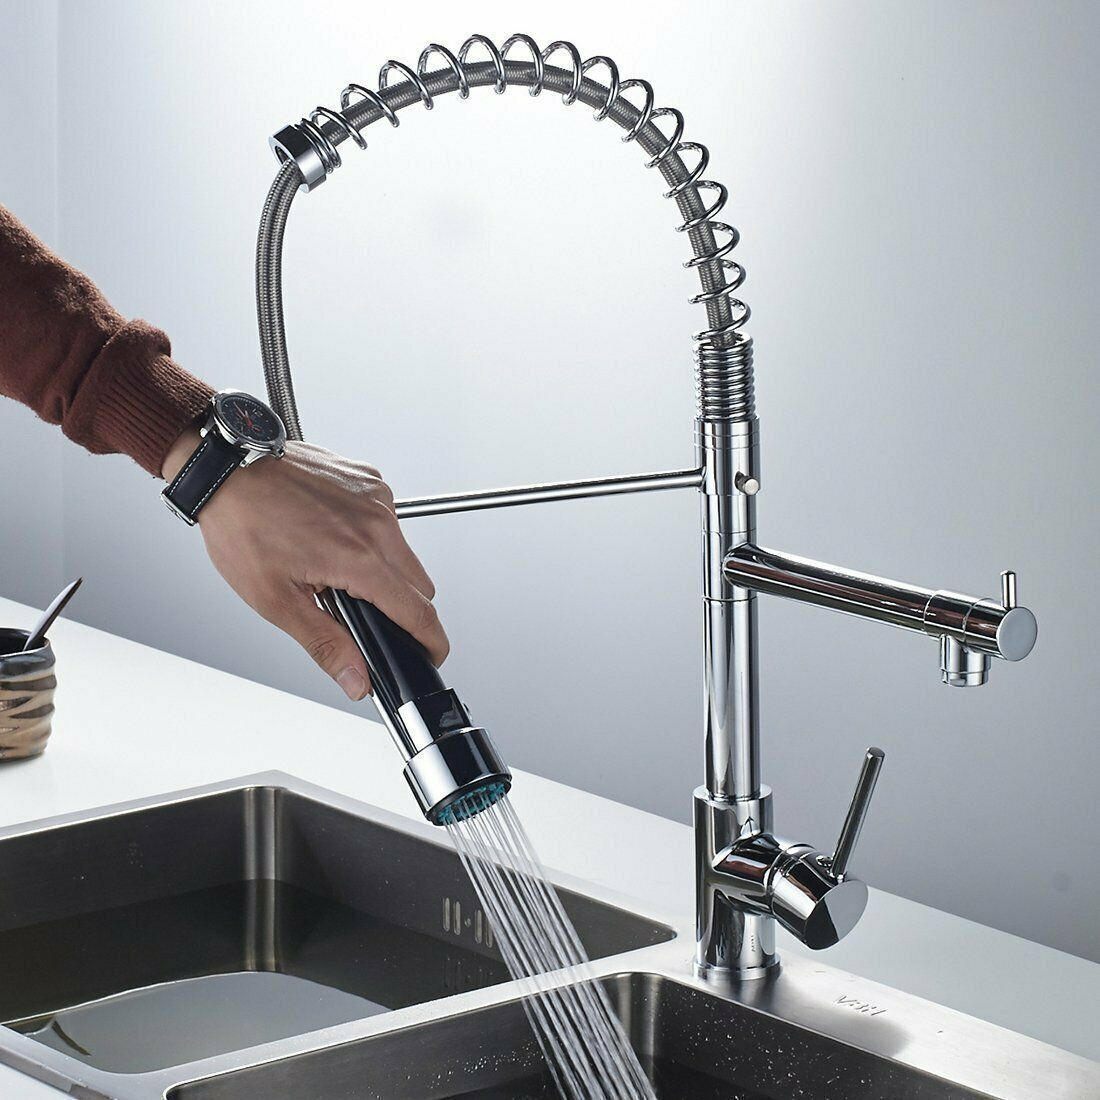 Spring Chrome Industrial Kitchen Bar Sink Faucet Pull Down Sprayer